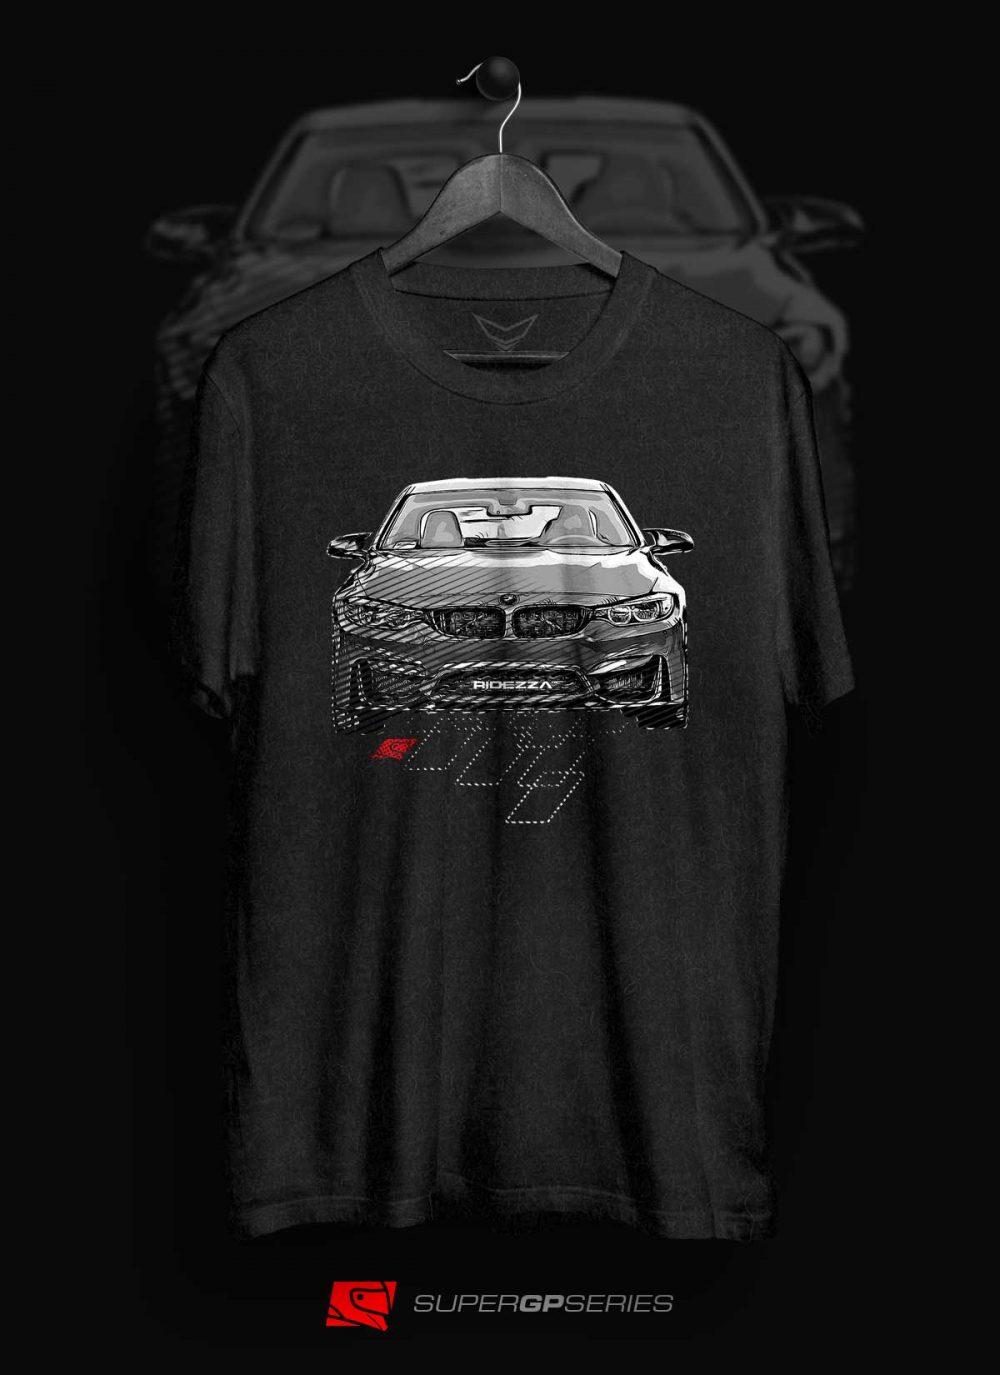 BMW M3 SuperGP Series T-Shirt